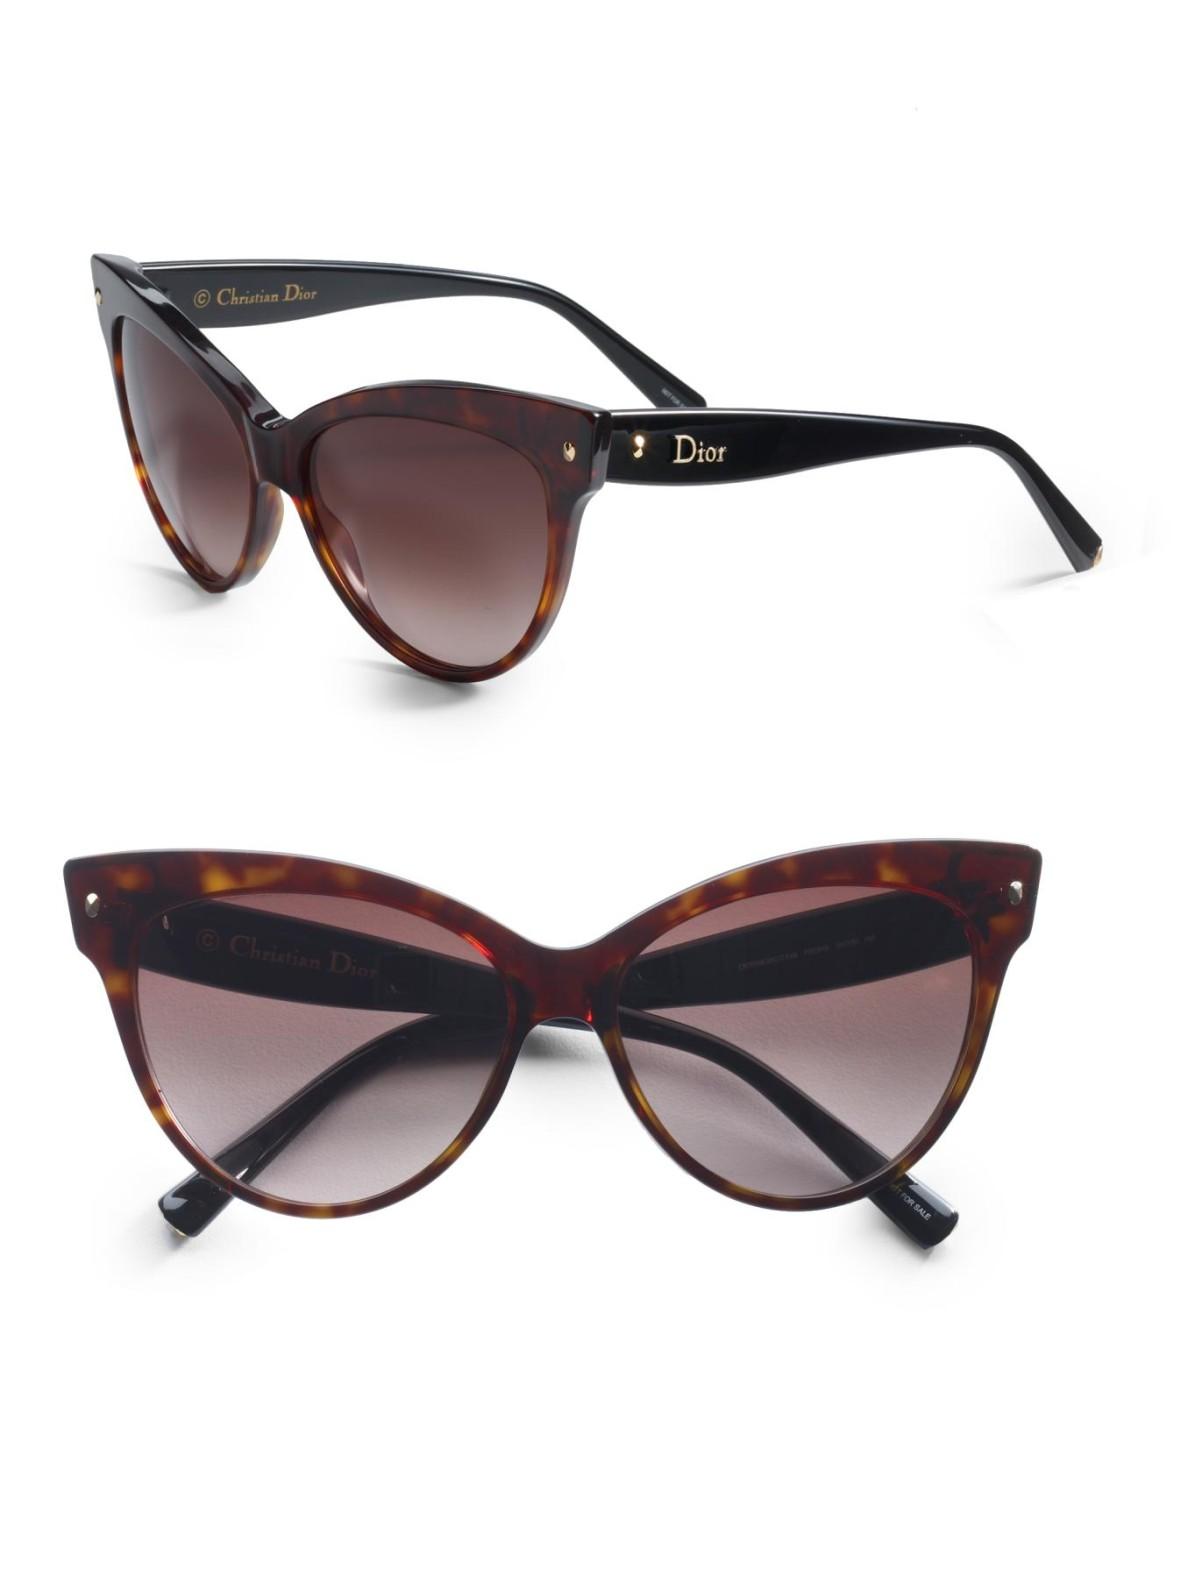 2c60baa3cd Dior Cateye Sunglasses in Brown - Lyst